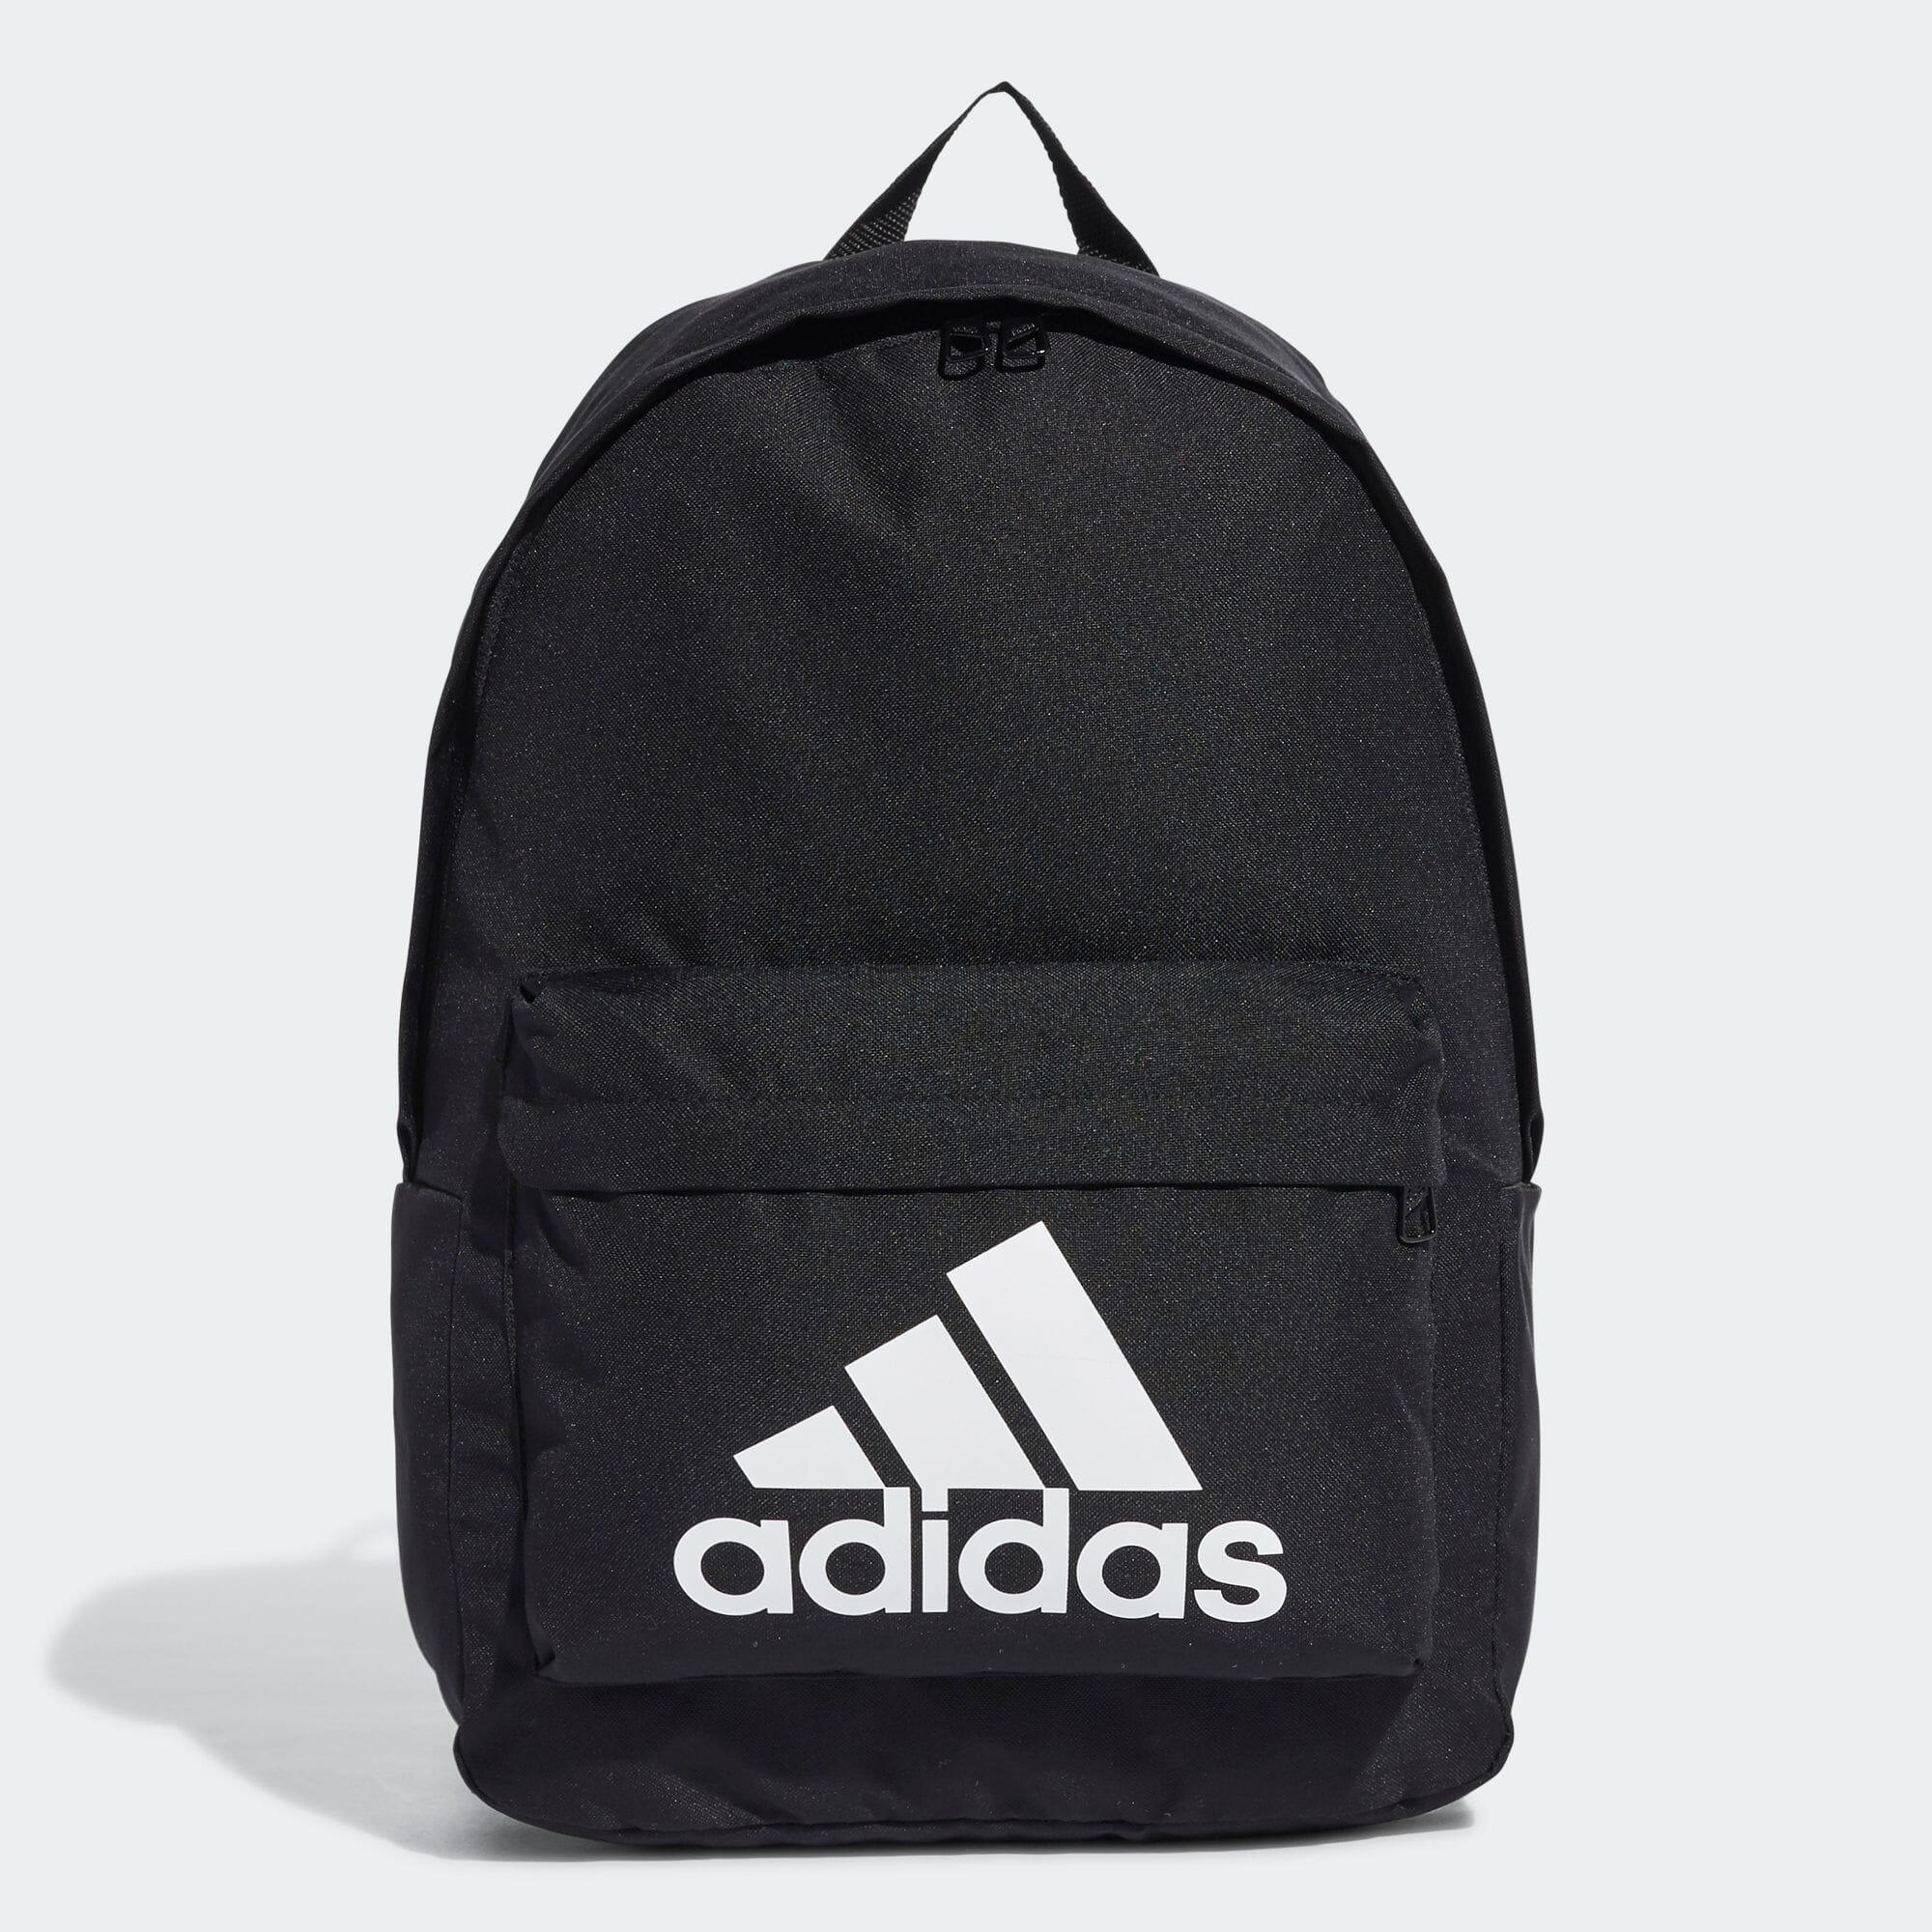 https://item.rakuten.co.jp/adidas/dv0079/